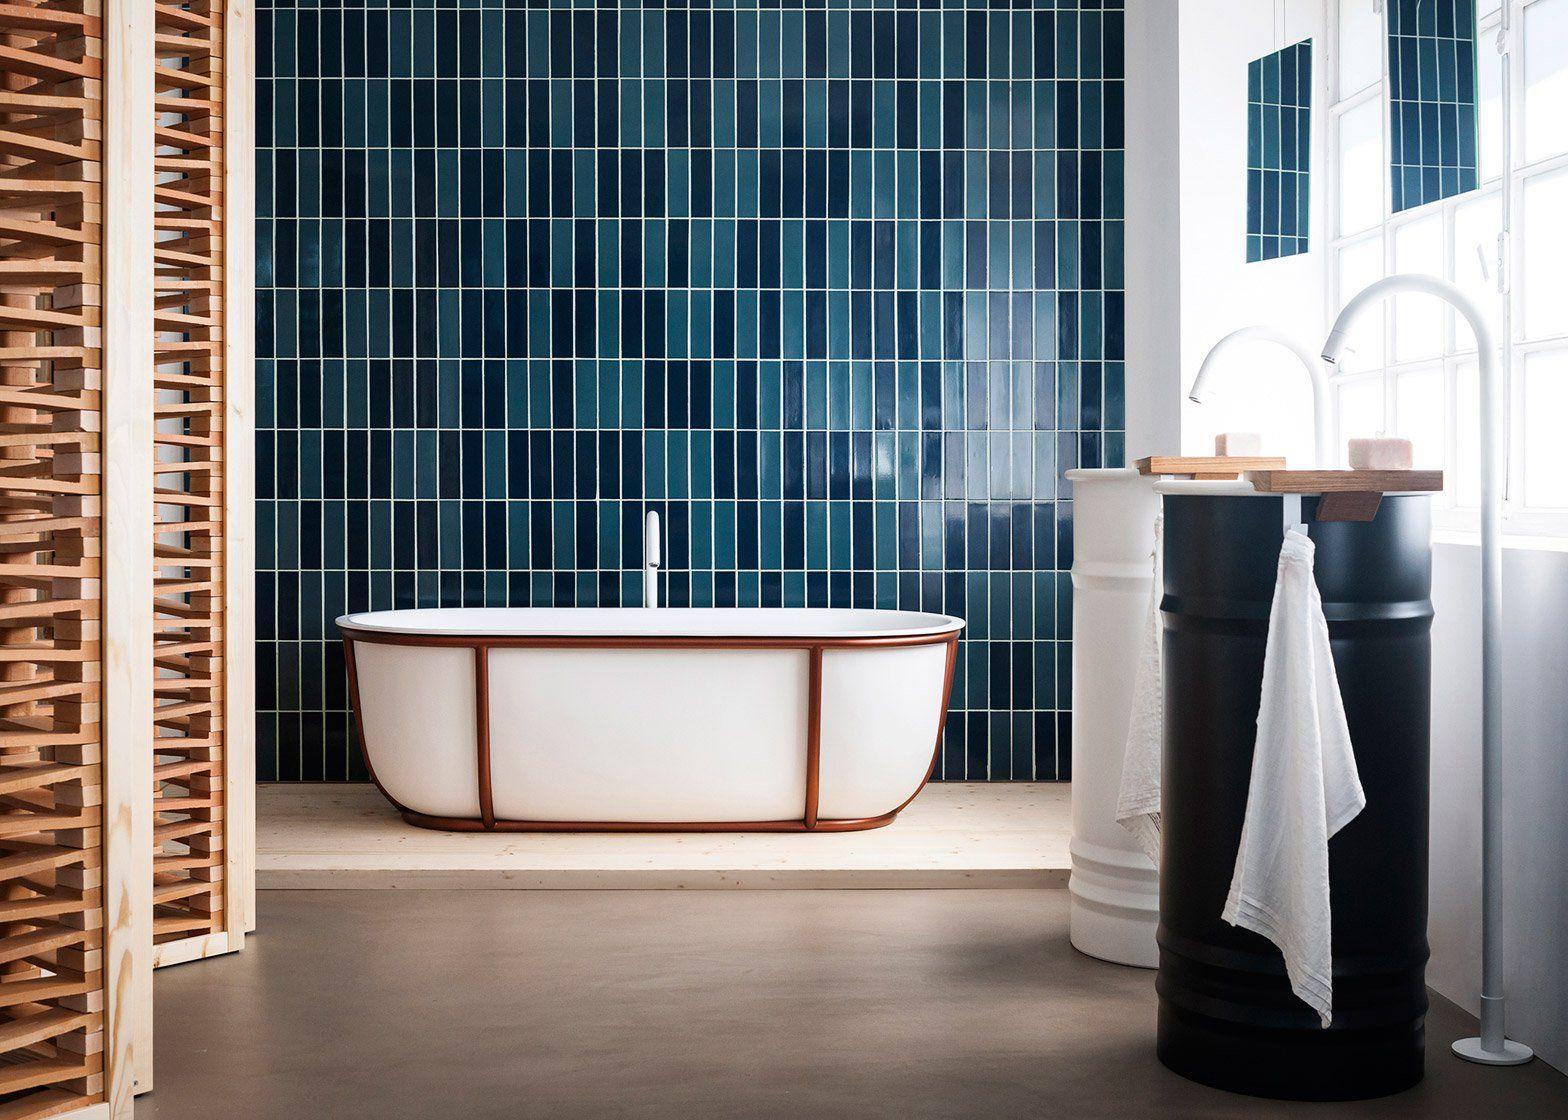 Patricia Urquiola\'s Cuna and Larian bathtubs for Agape | B A T H ...